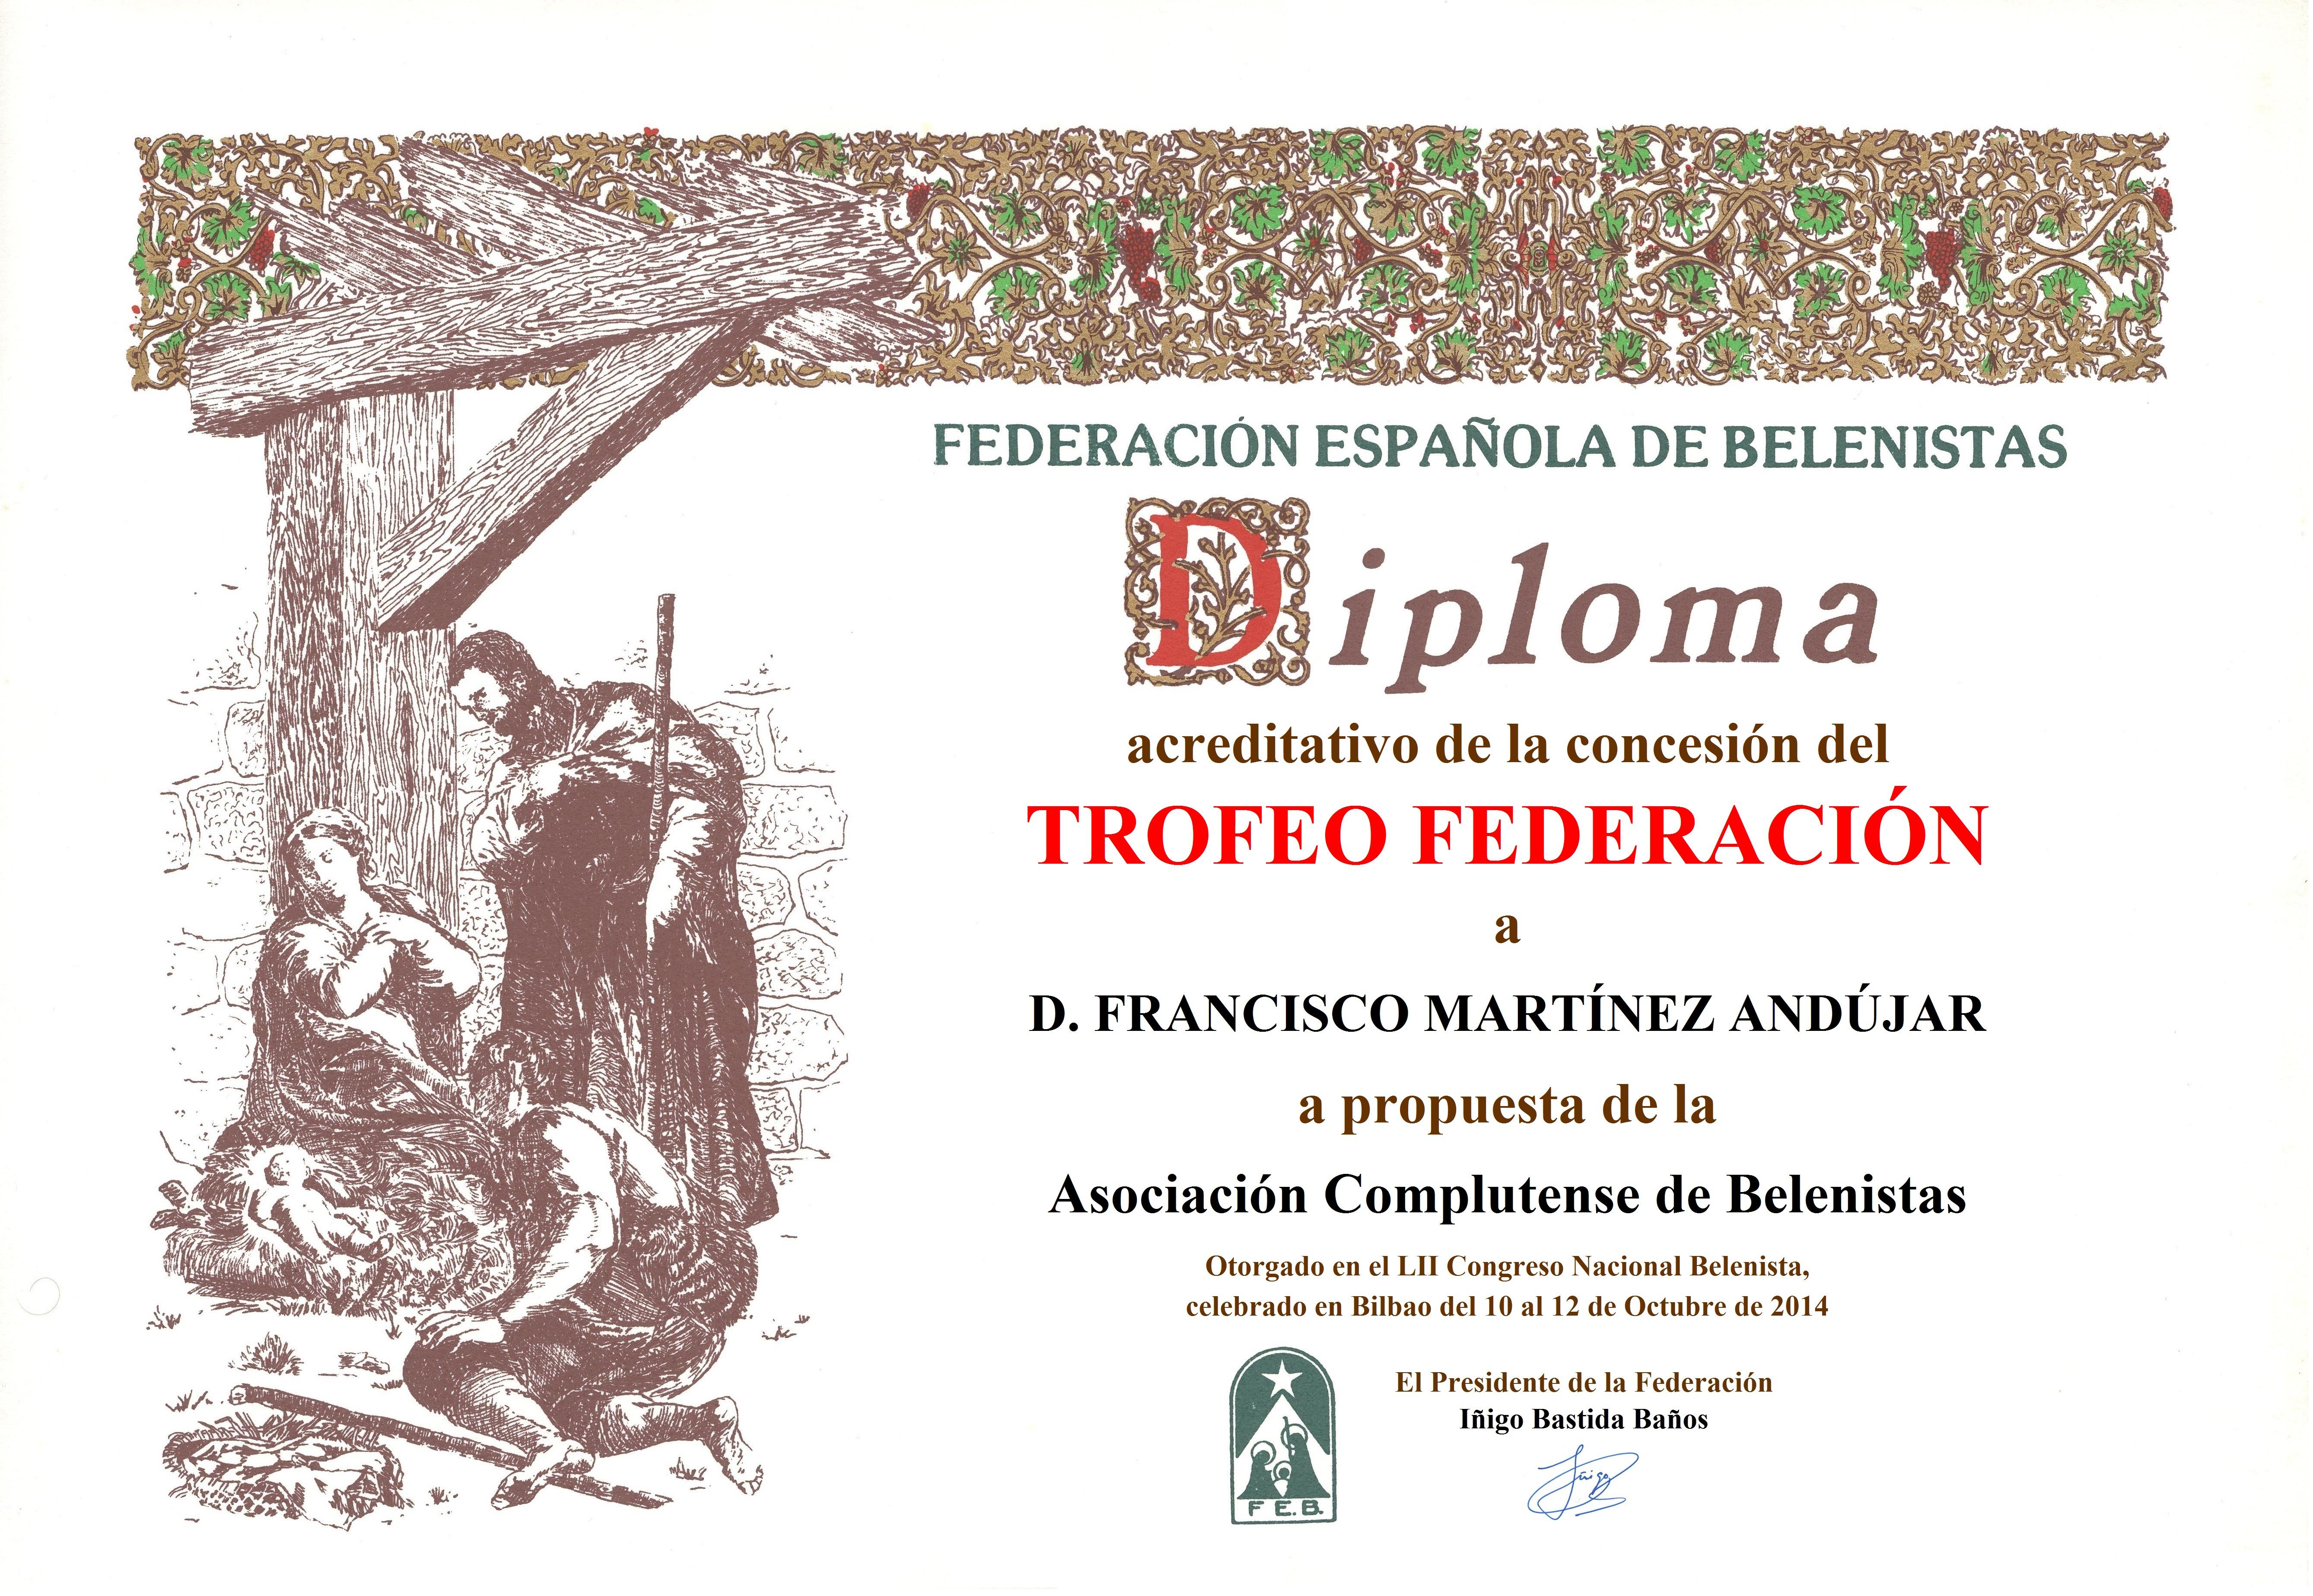 Diploma Trofeo FEB 2014 Francisco Martínez Andújar